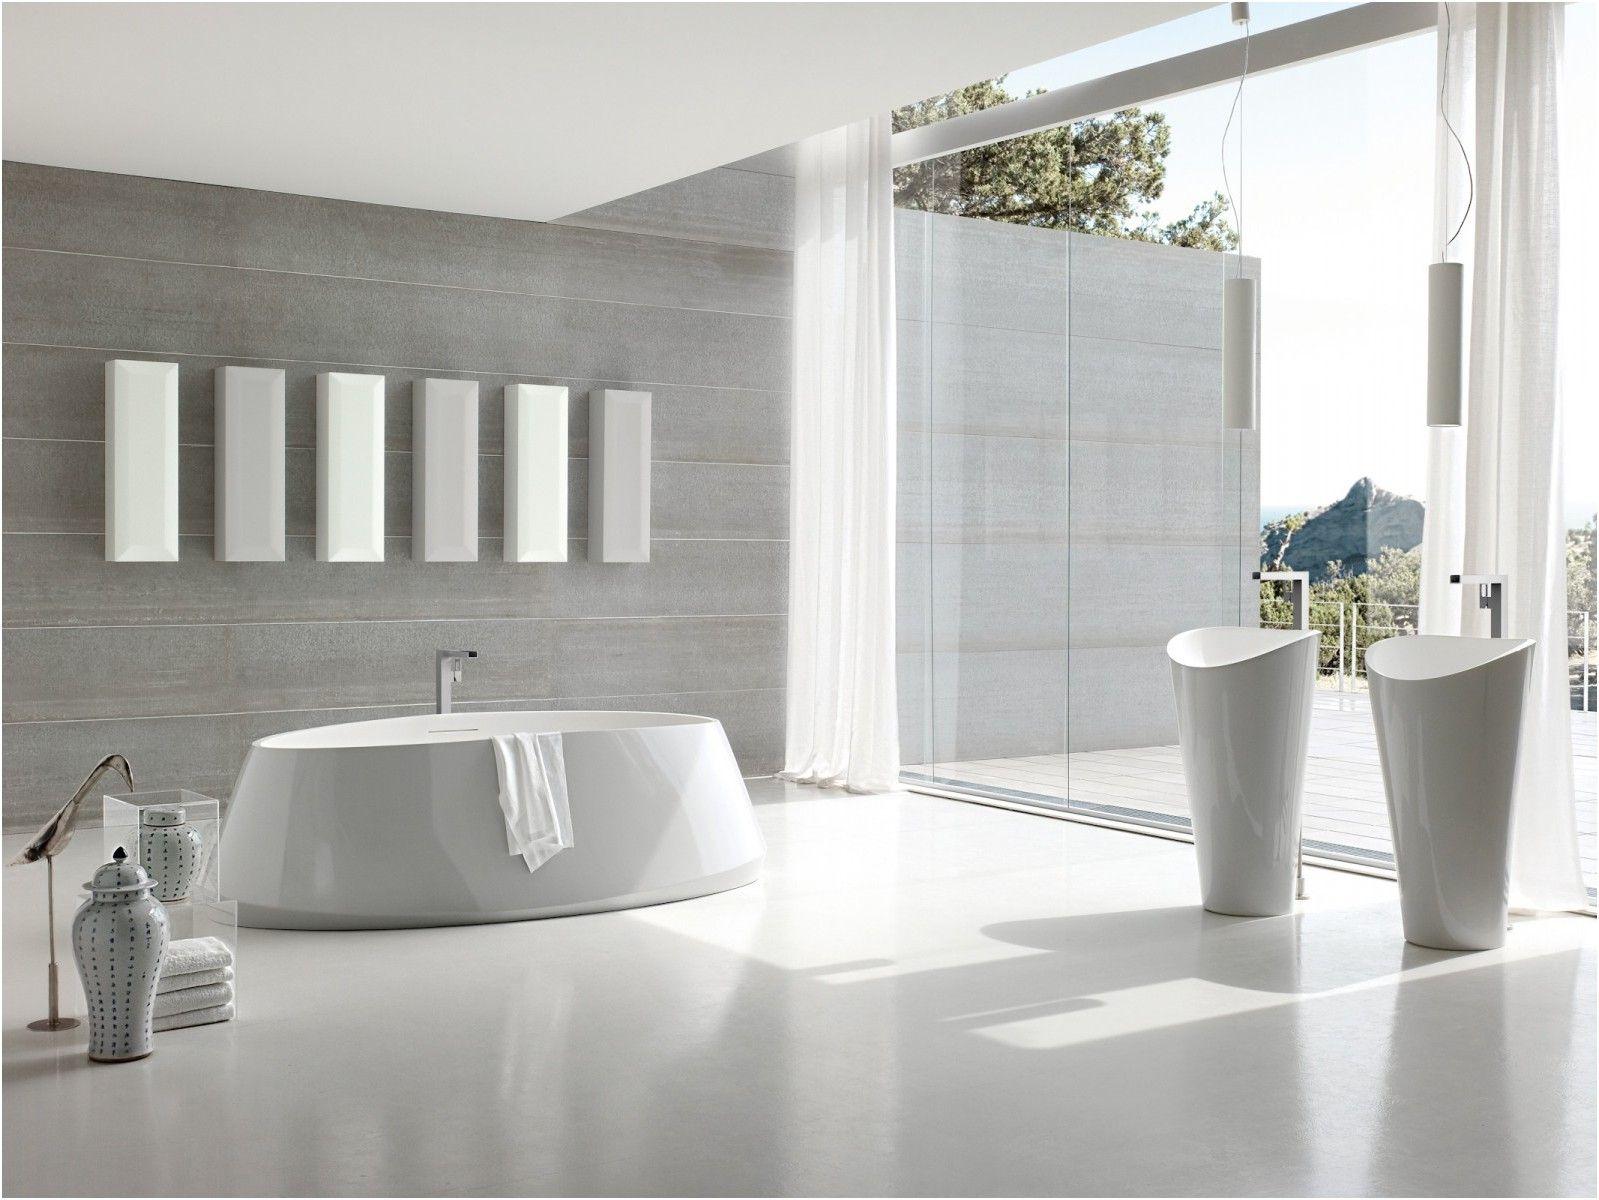 Ultra Modern Italian Bathroom Design From Italian Bathroom Classy Ultra Modern Bathroom Designs Design Decoration